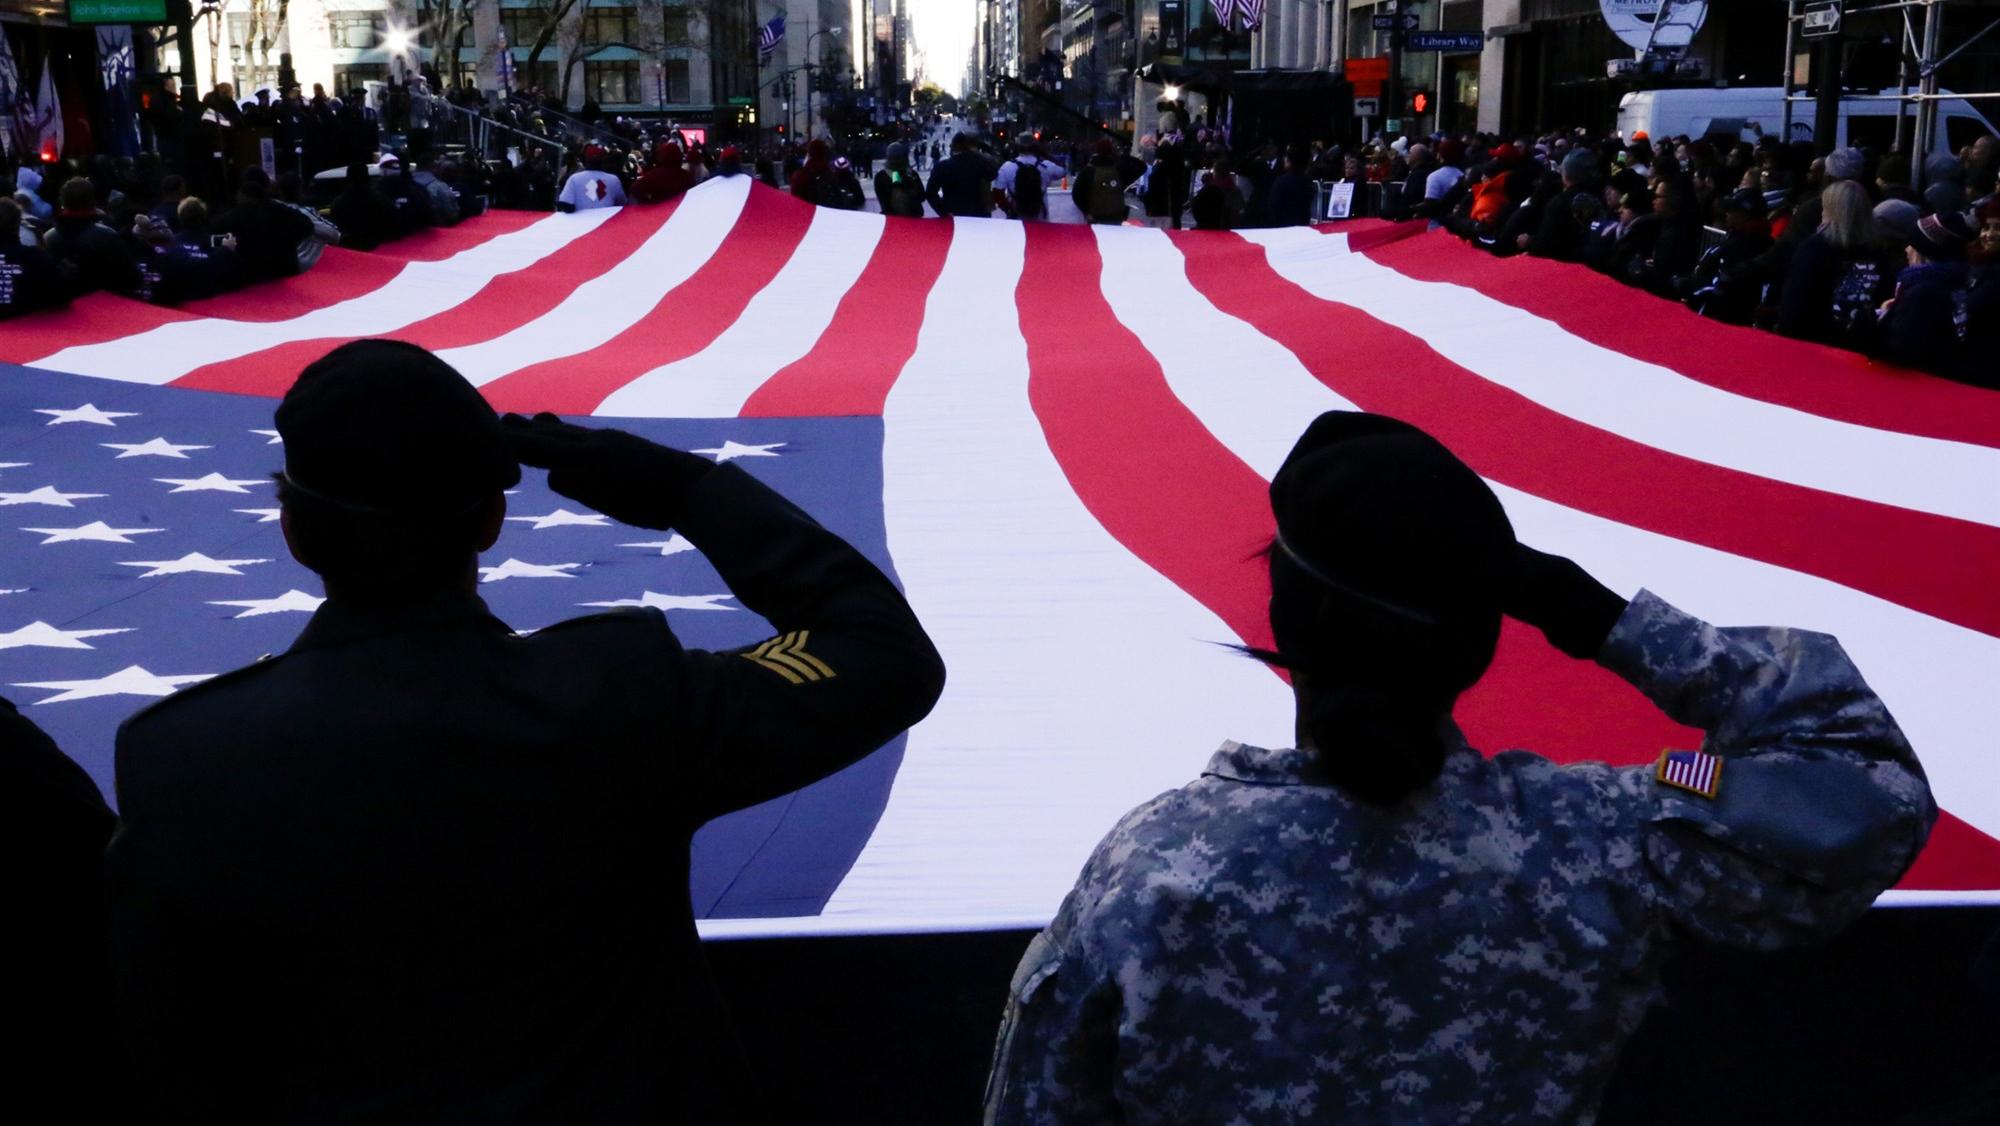 181111-veterans-al-1204_a2e7d9b912dbcd360c8abc818a250c80.fit-2000w (1)_1542039032563.jpg.jpg